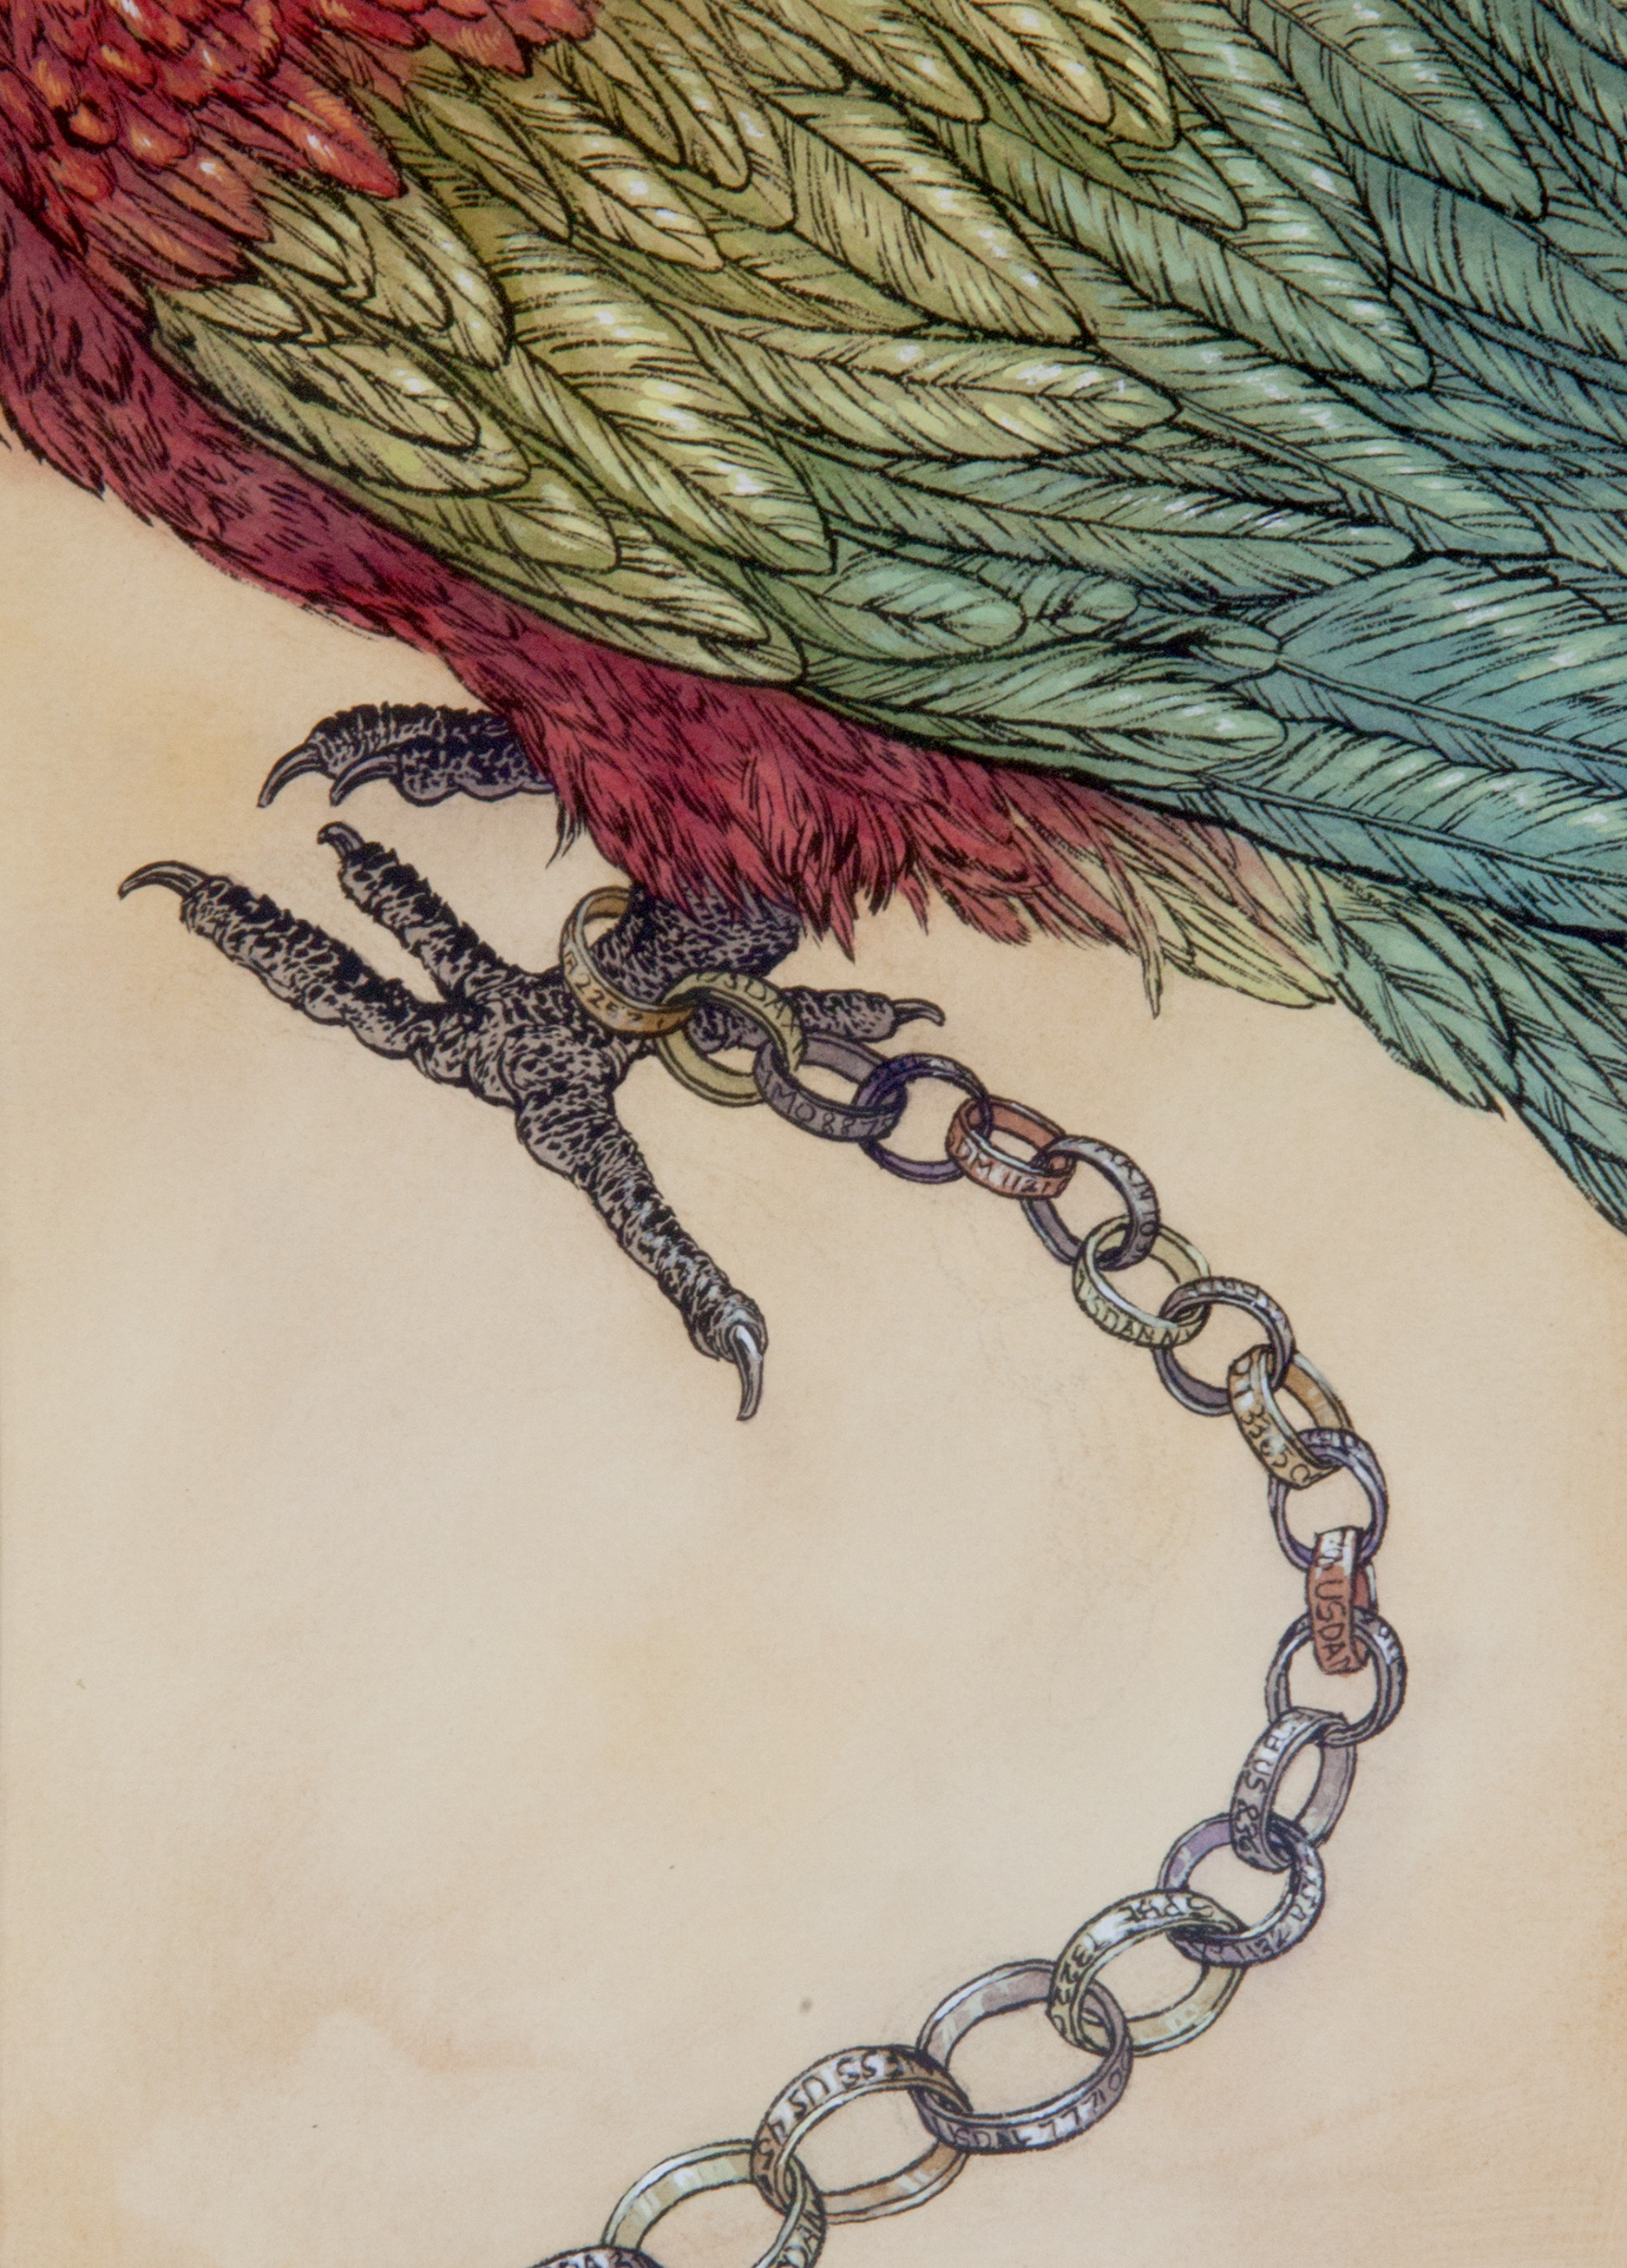 (Emily Poole painting)